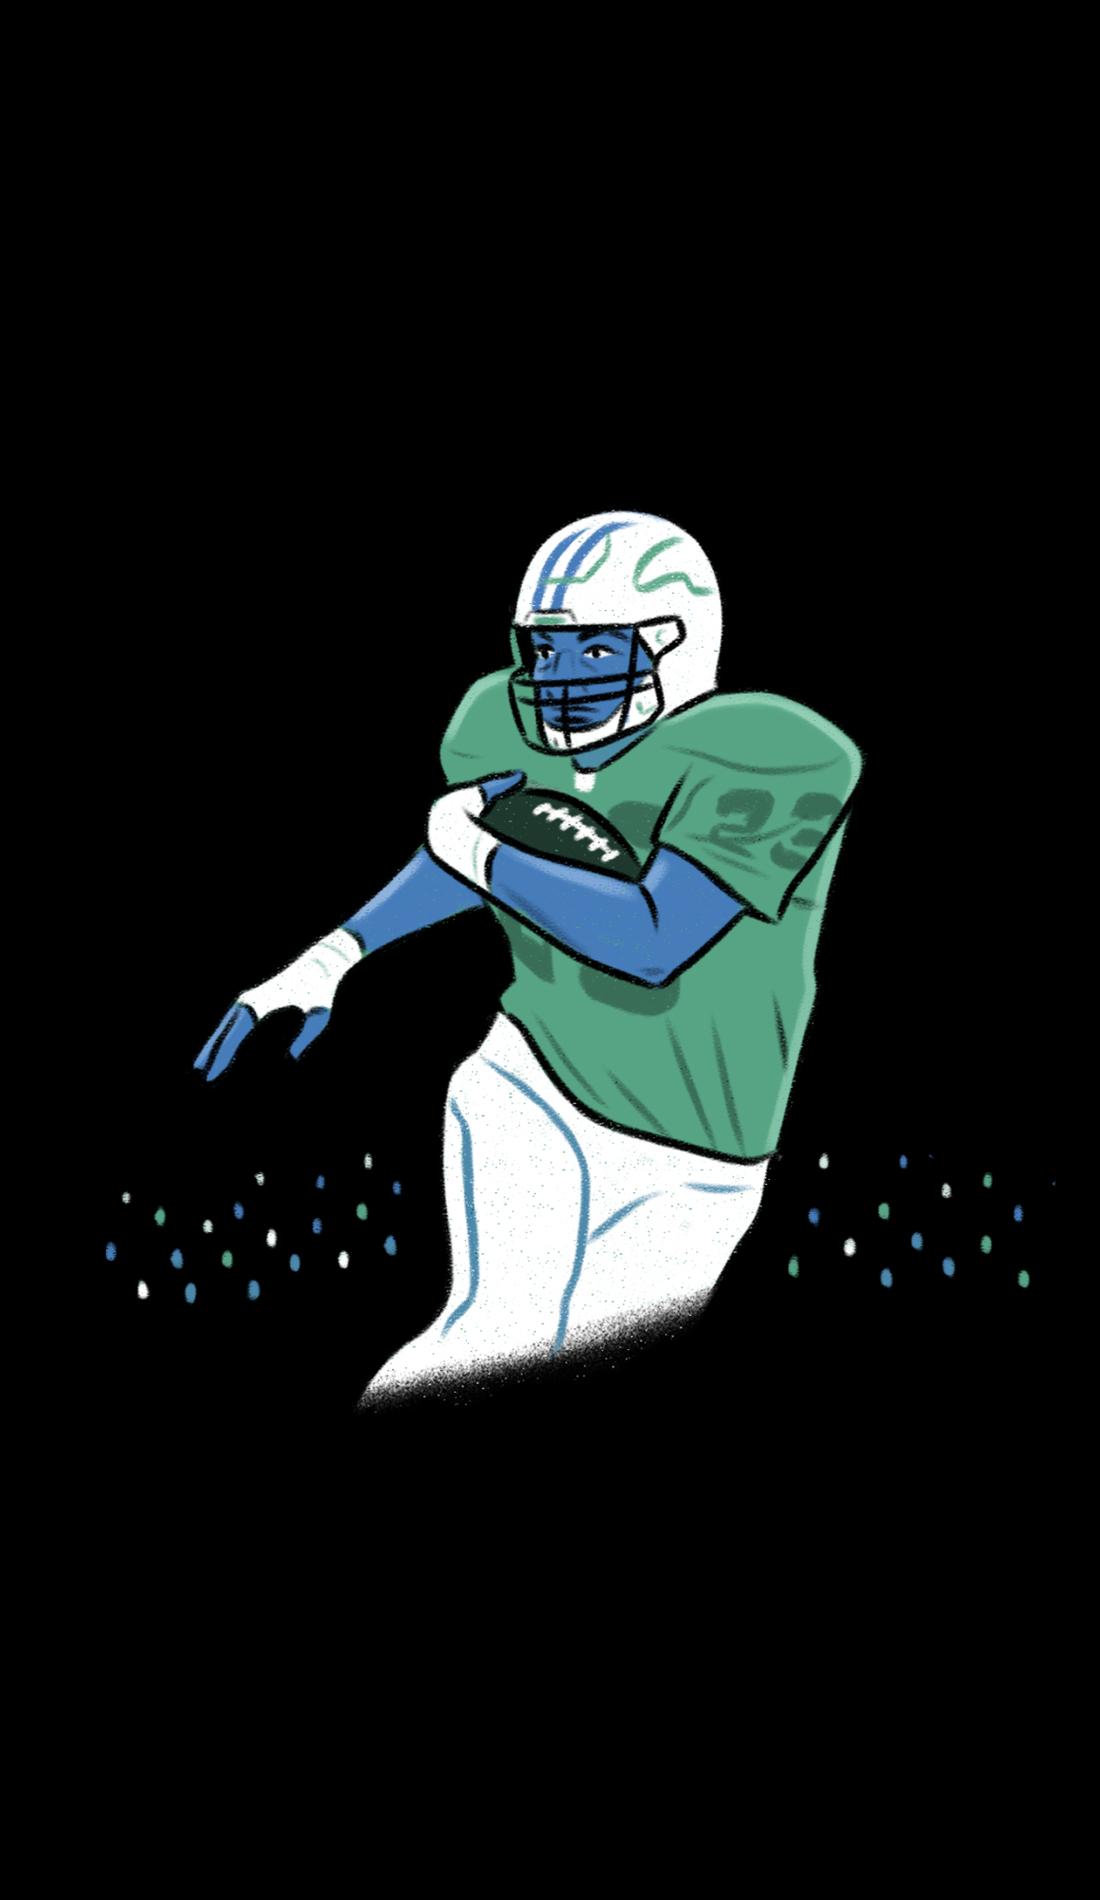 A Southeastern Louisiana Lions Football live event